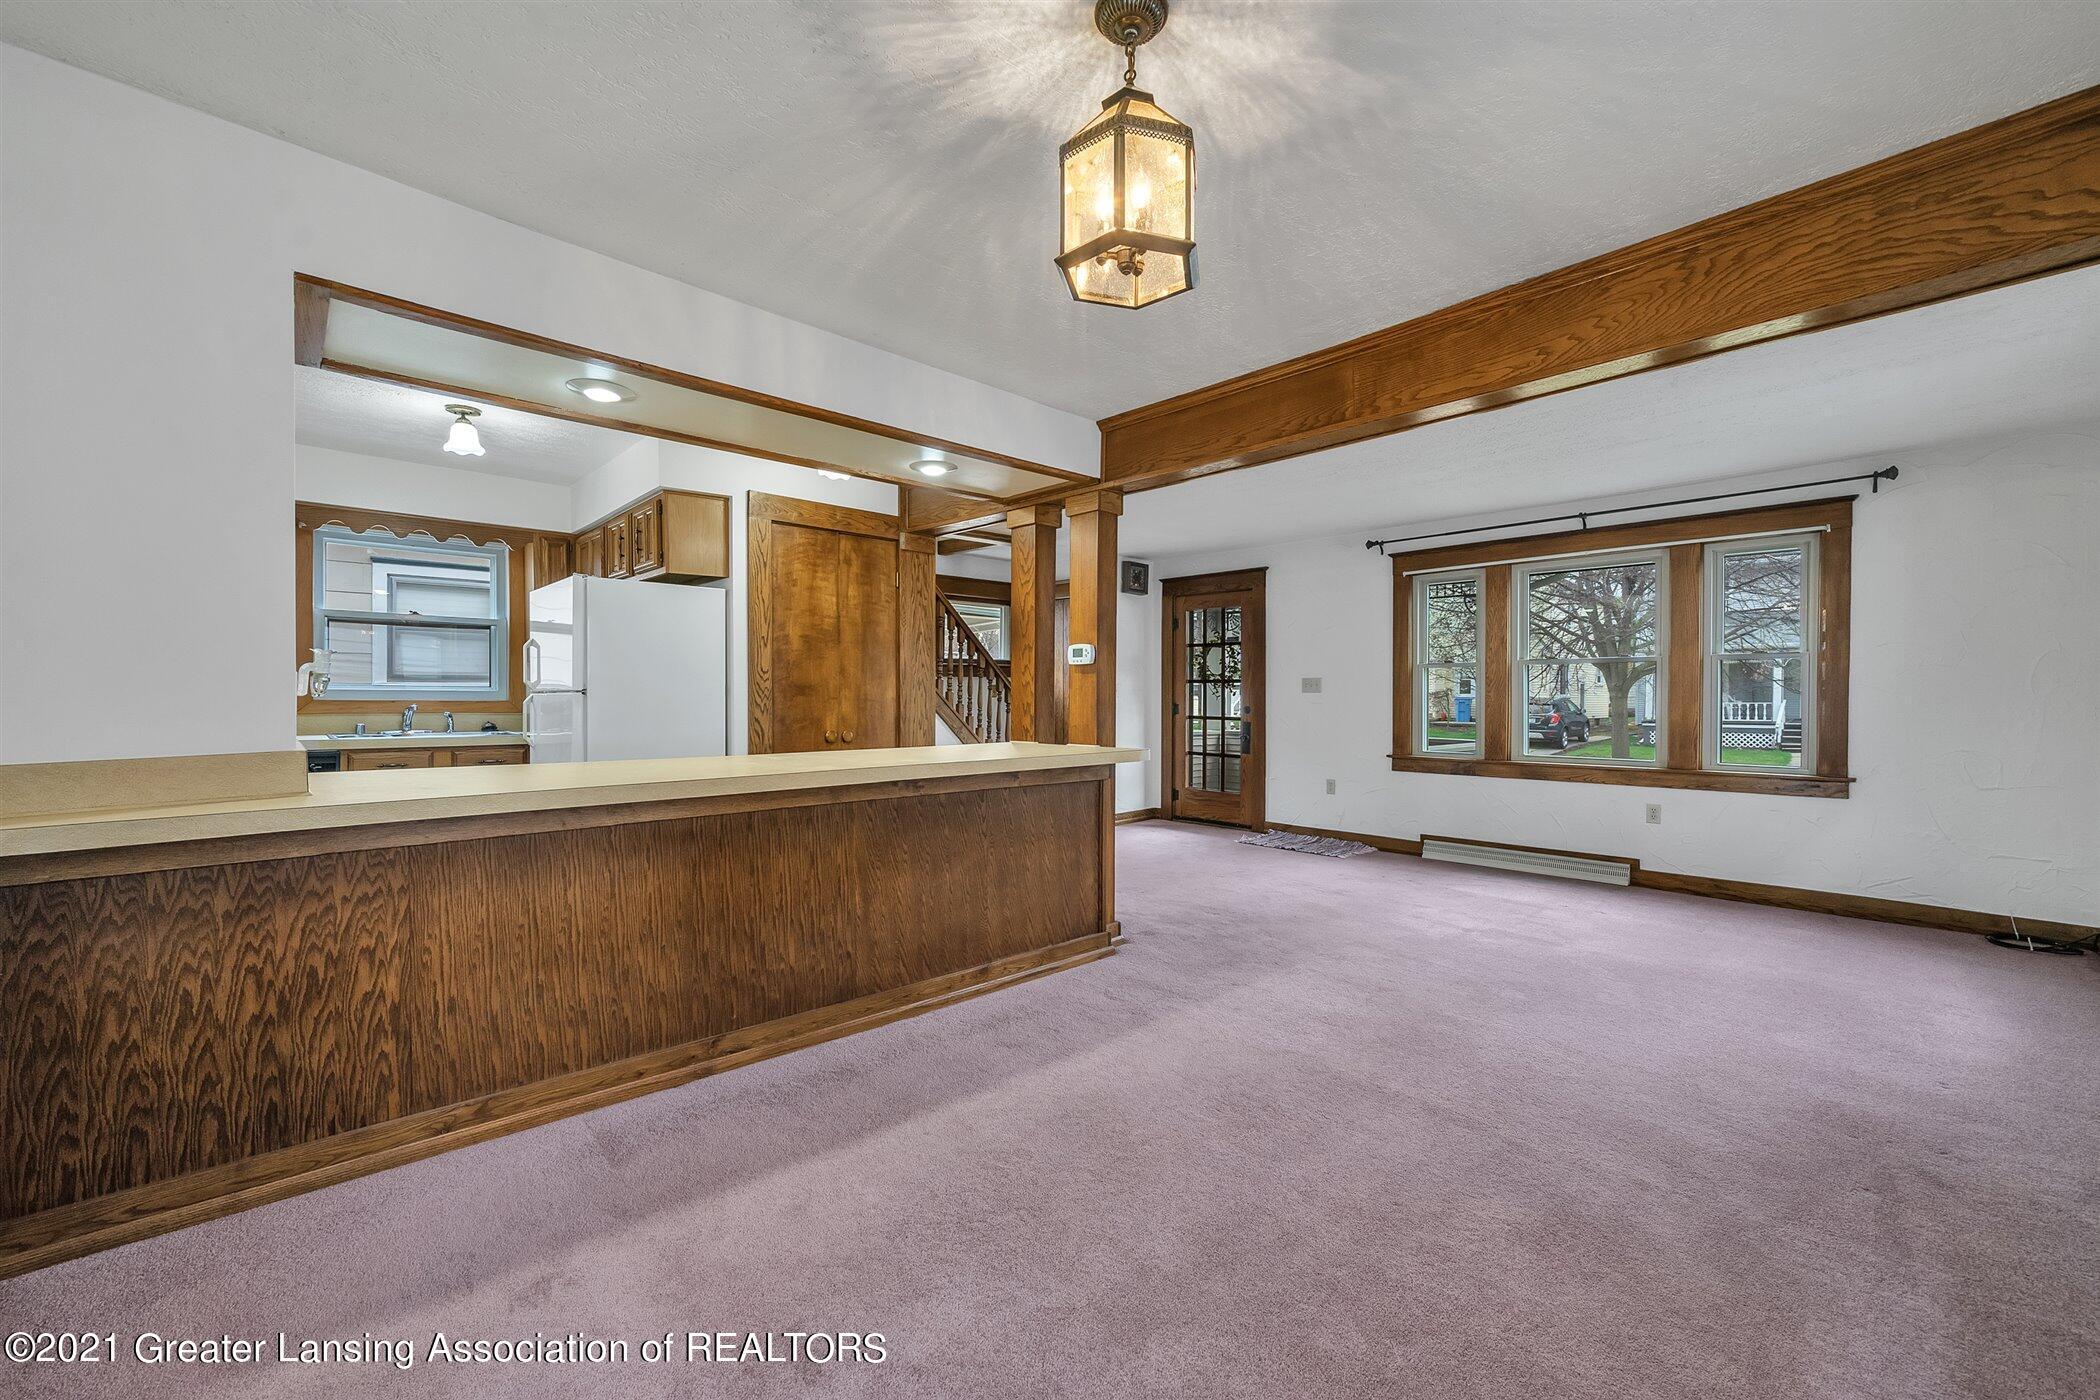 726 N Magnolia Ave - (5) MAIN FLOOR Dining Room - 6